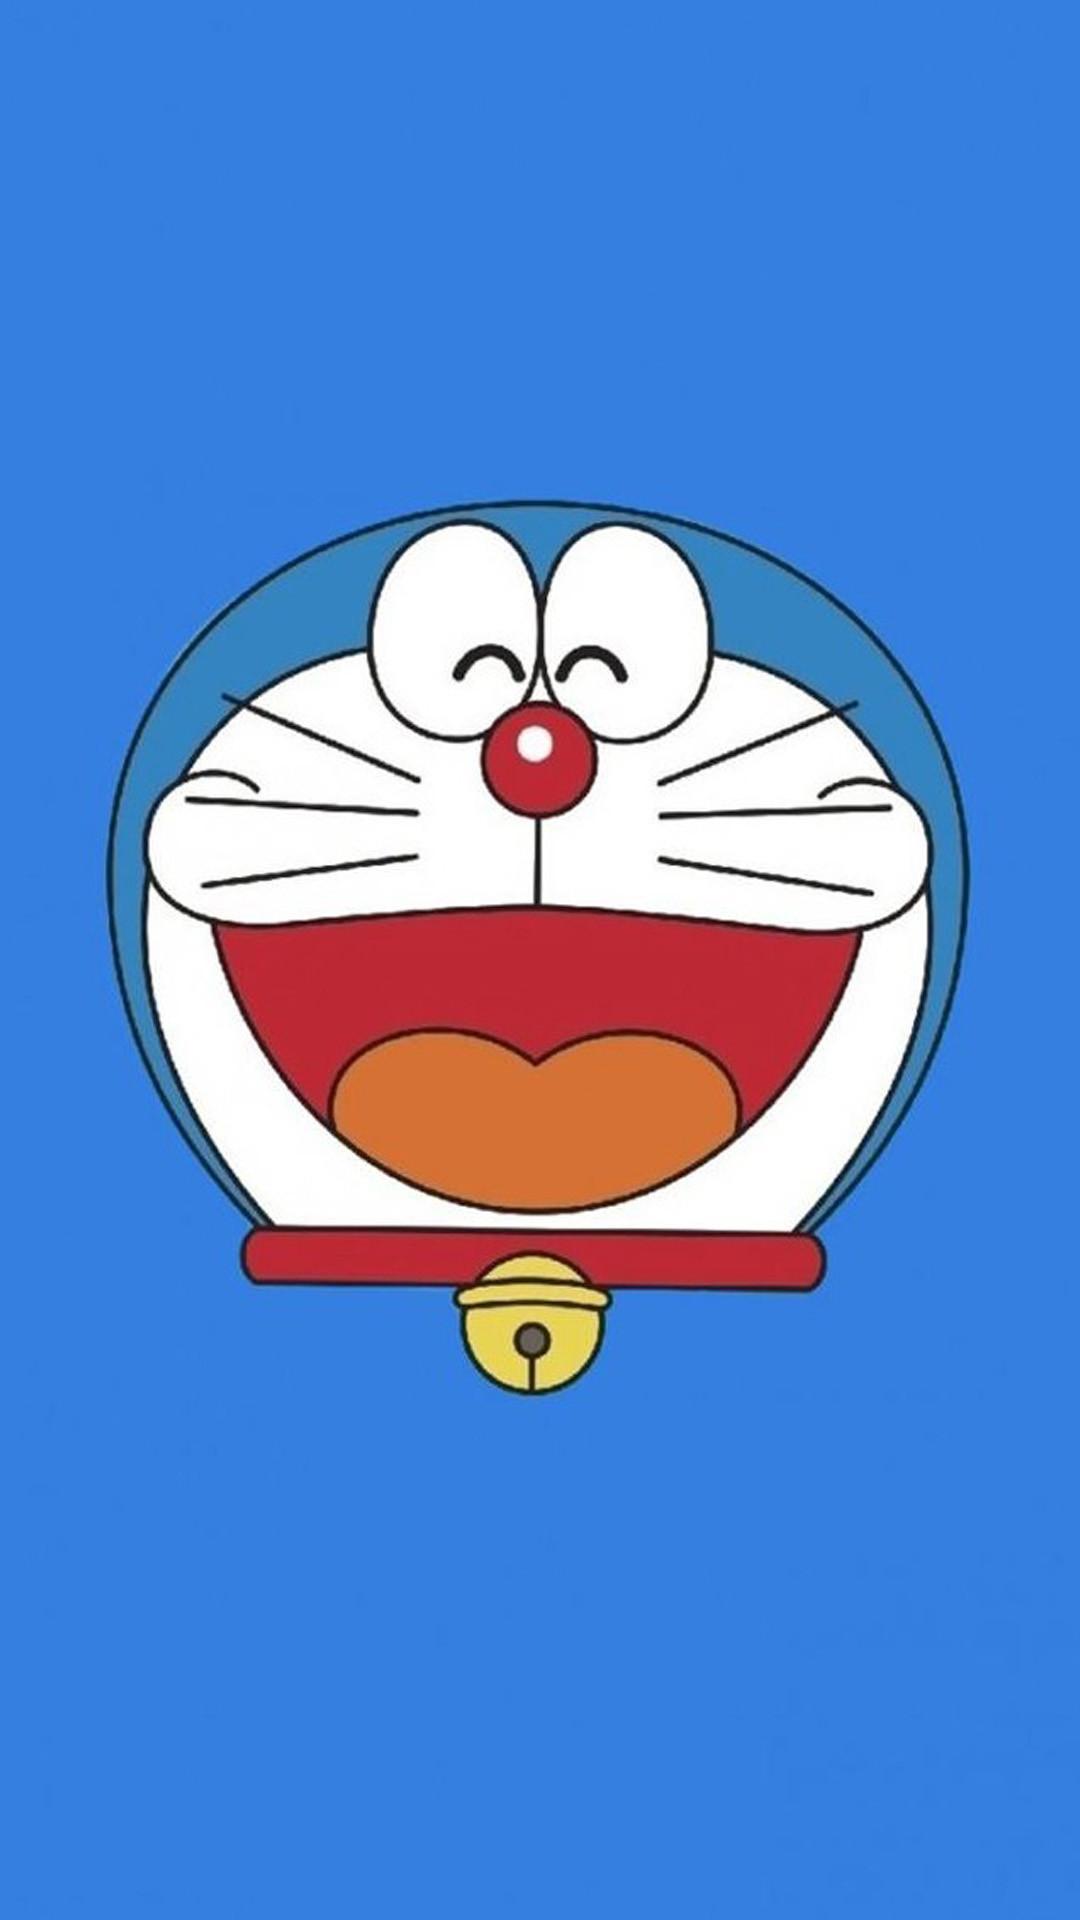 Doraemon 4k Mobile Wallpapers - Wallpaper Cave